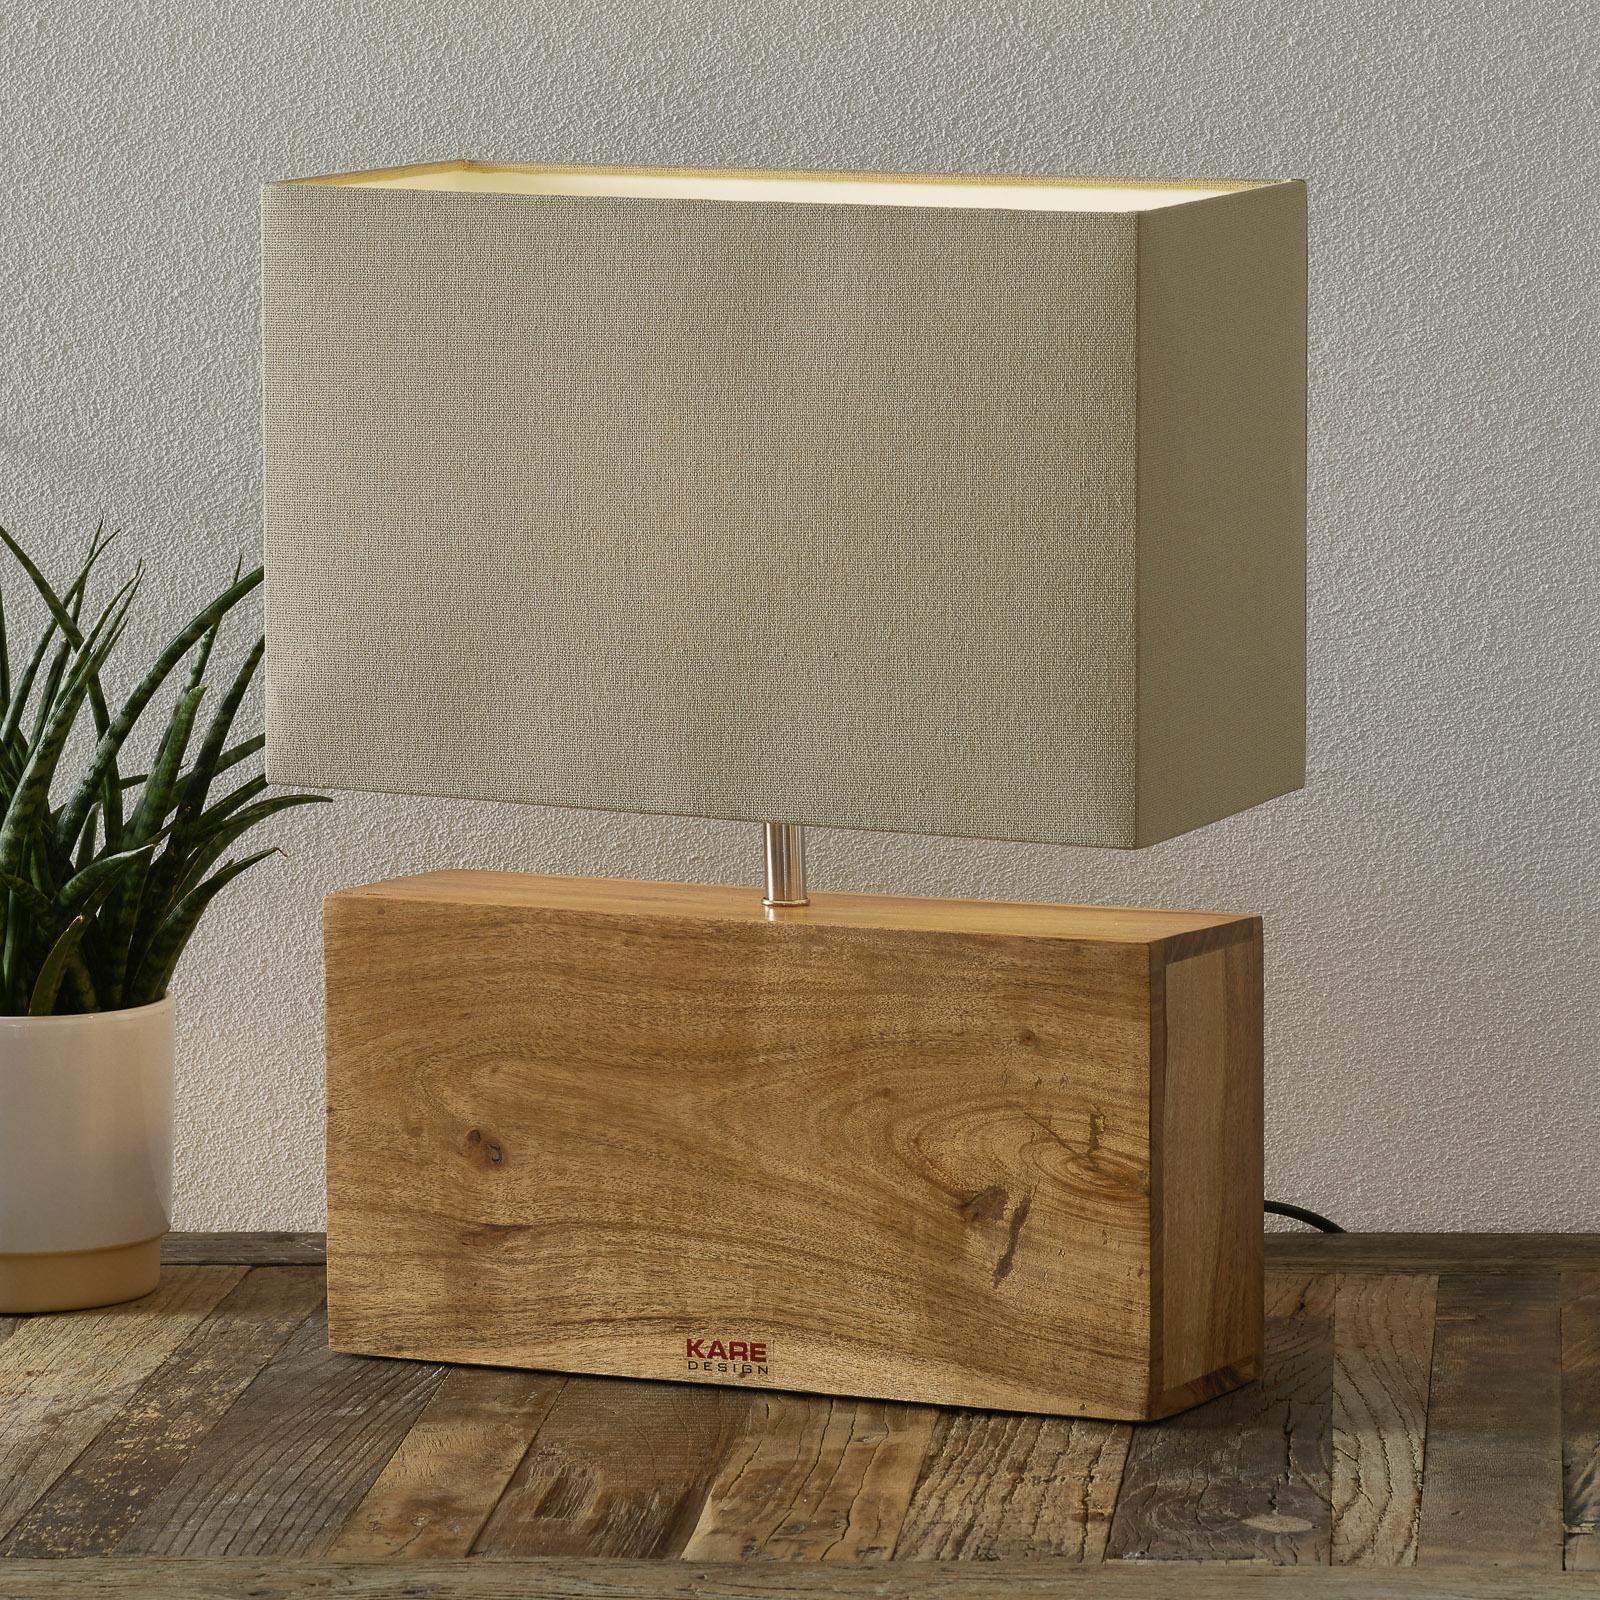 KARE Rectangular Wood - tafellamp met houten voet